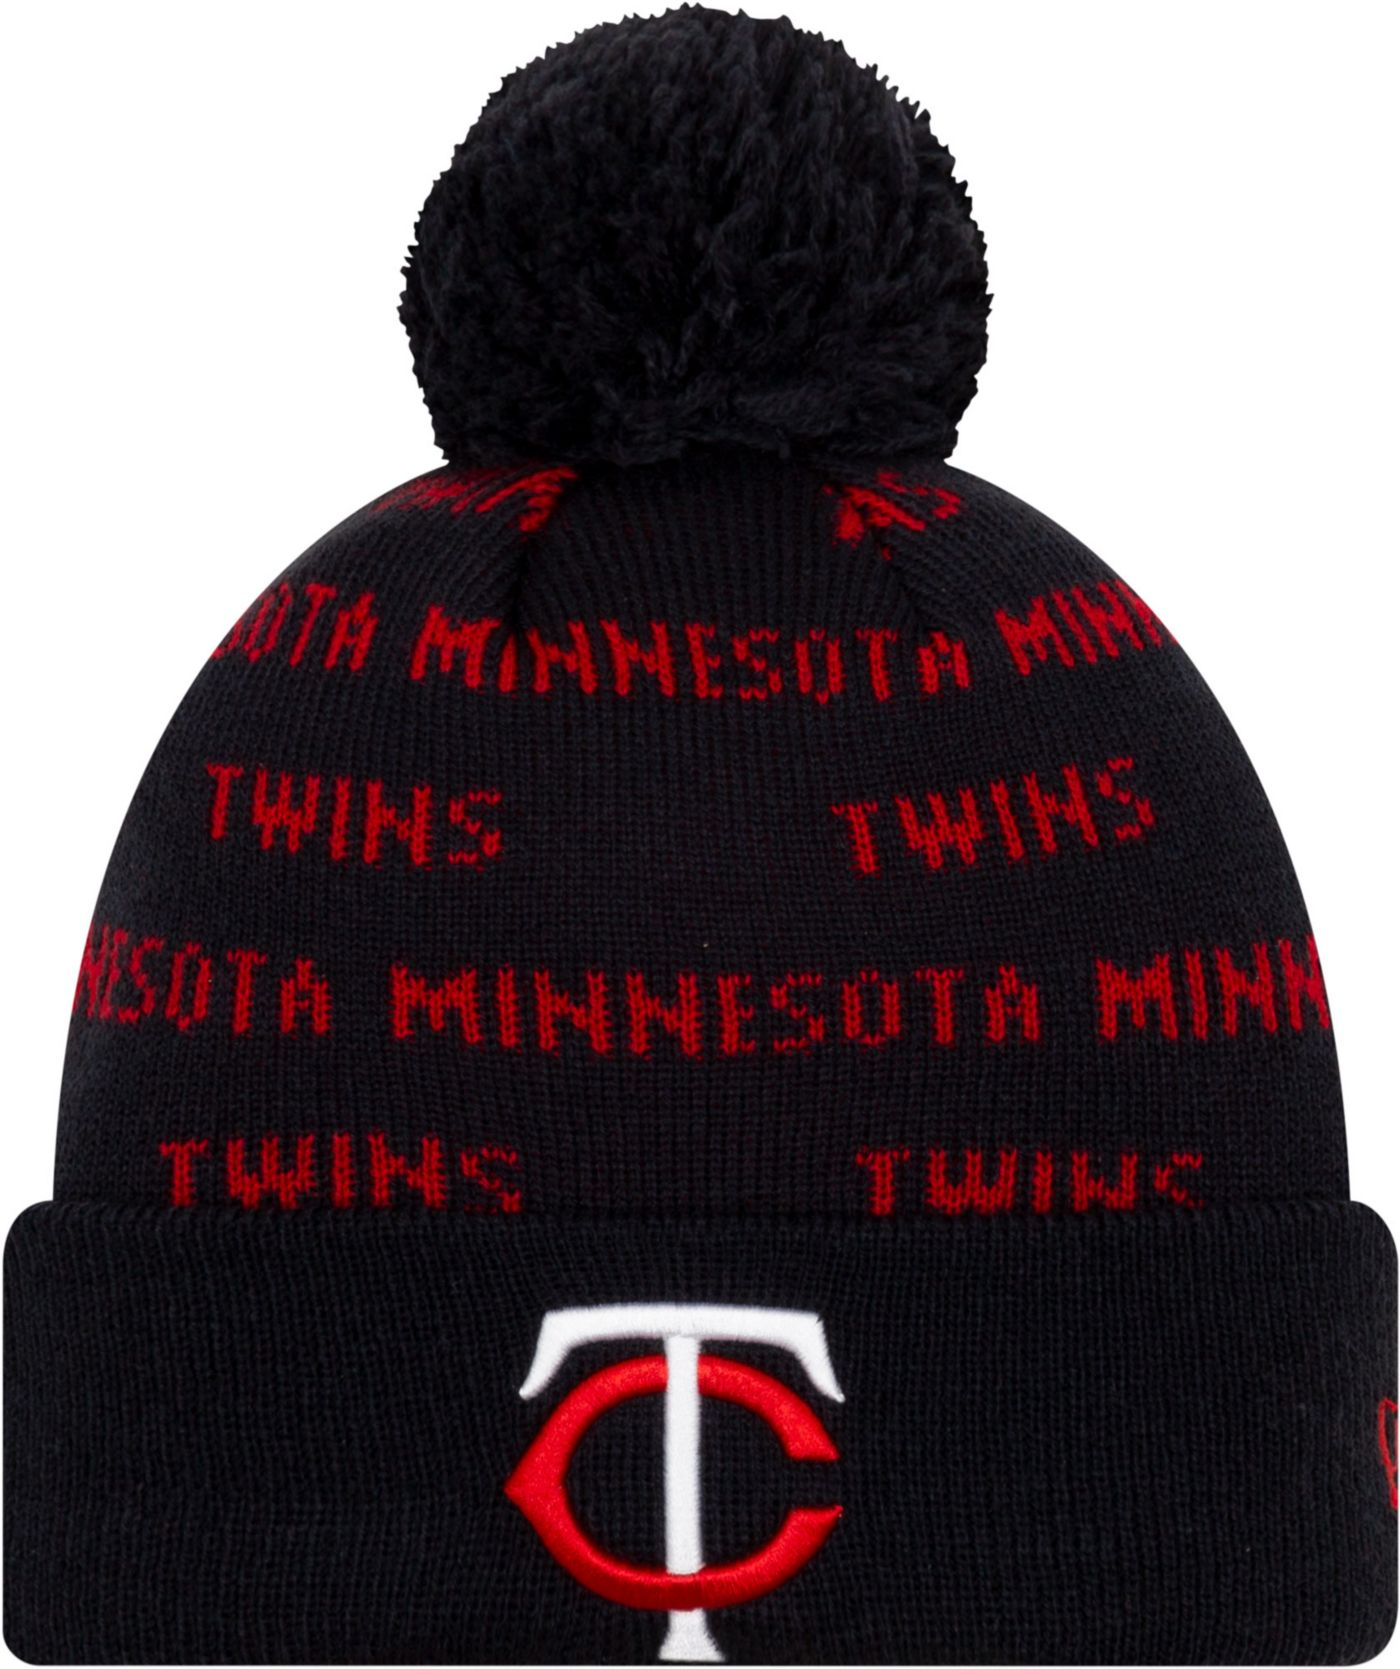 New Era Youth Minnesota Twins Repeat Knit Hat